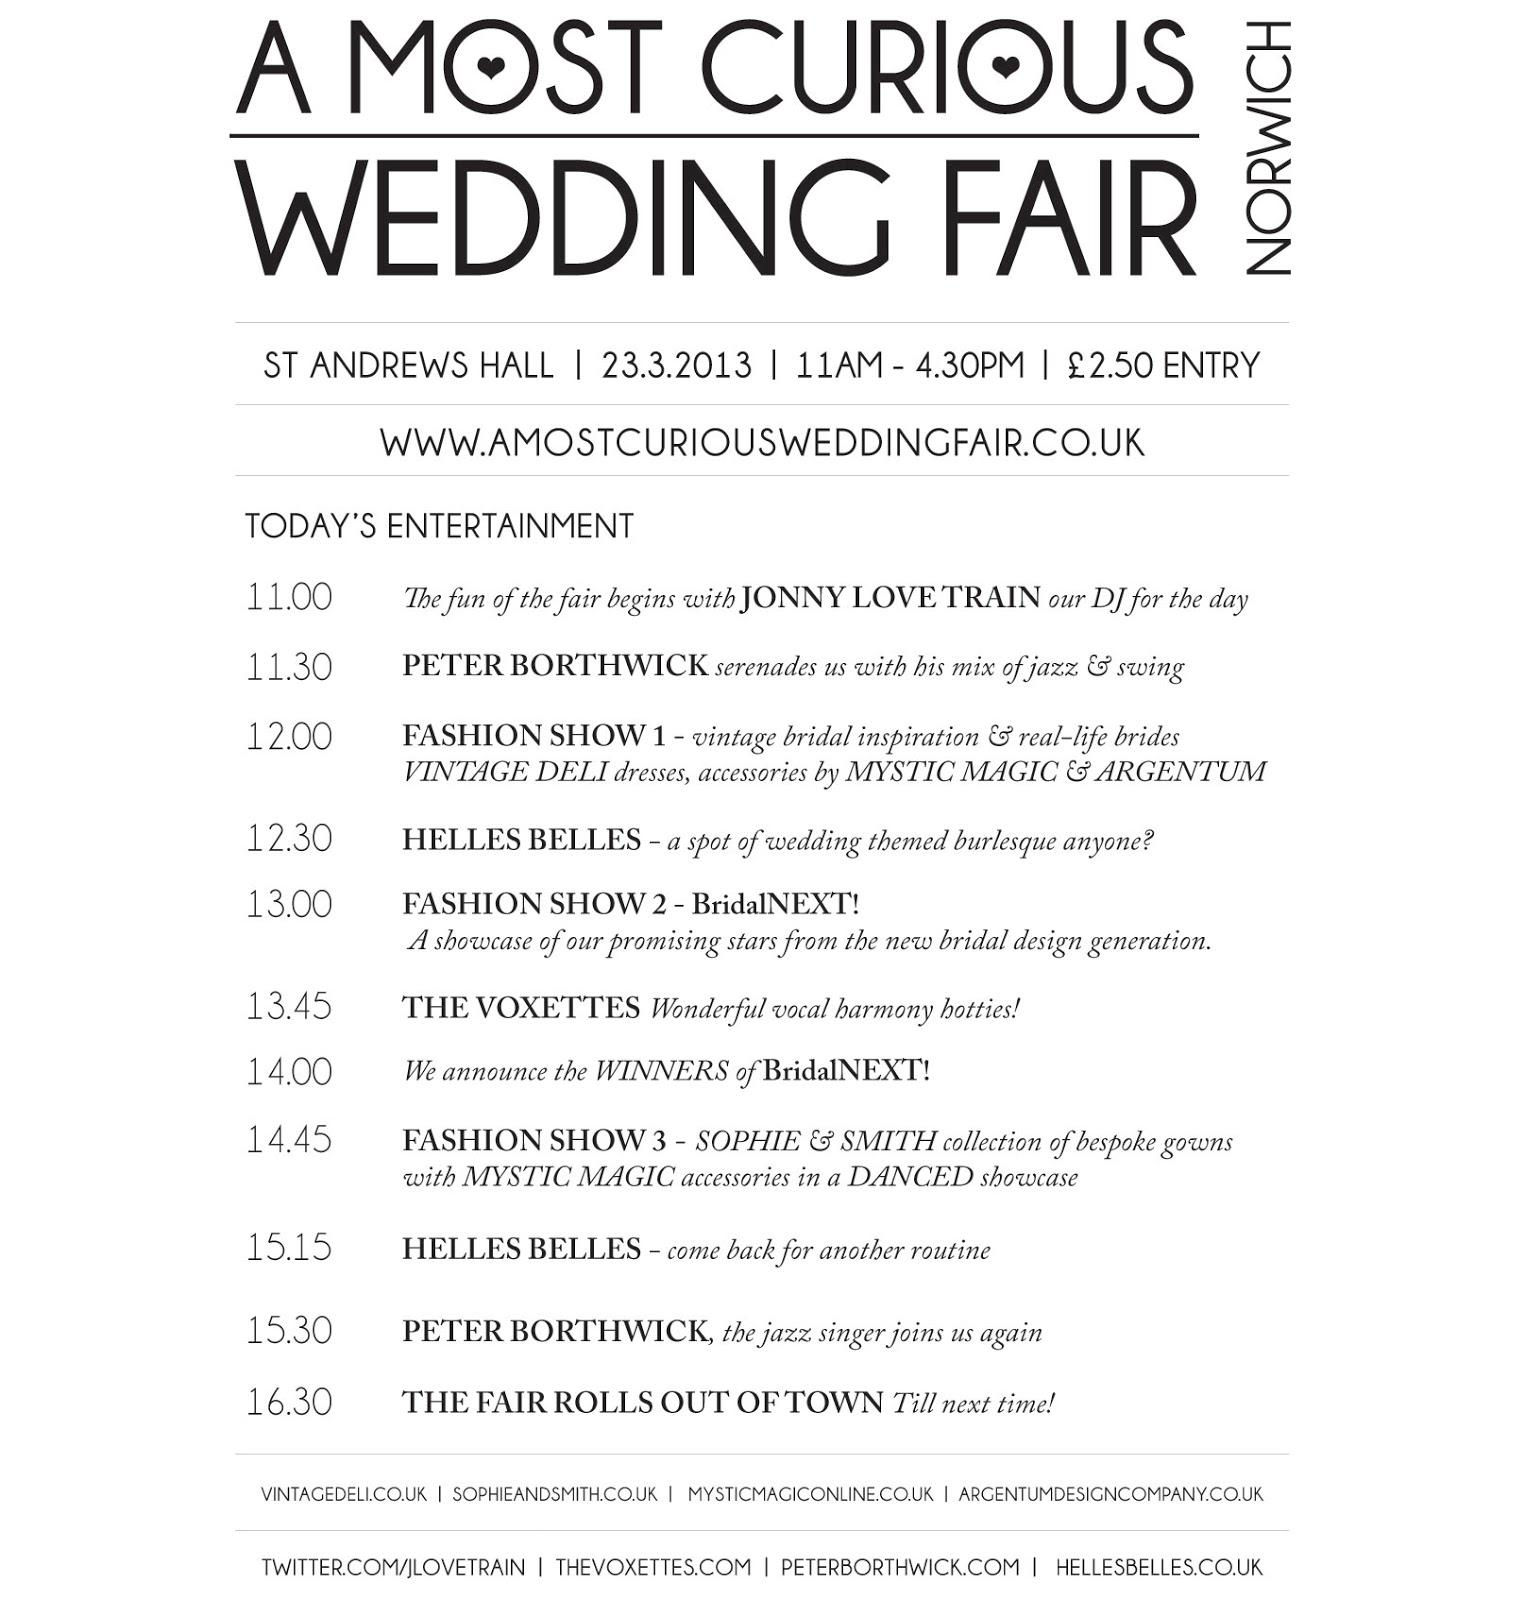 A Most Curious Wedding Fair Blog: March 2013